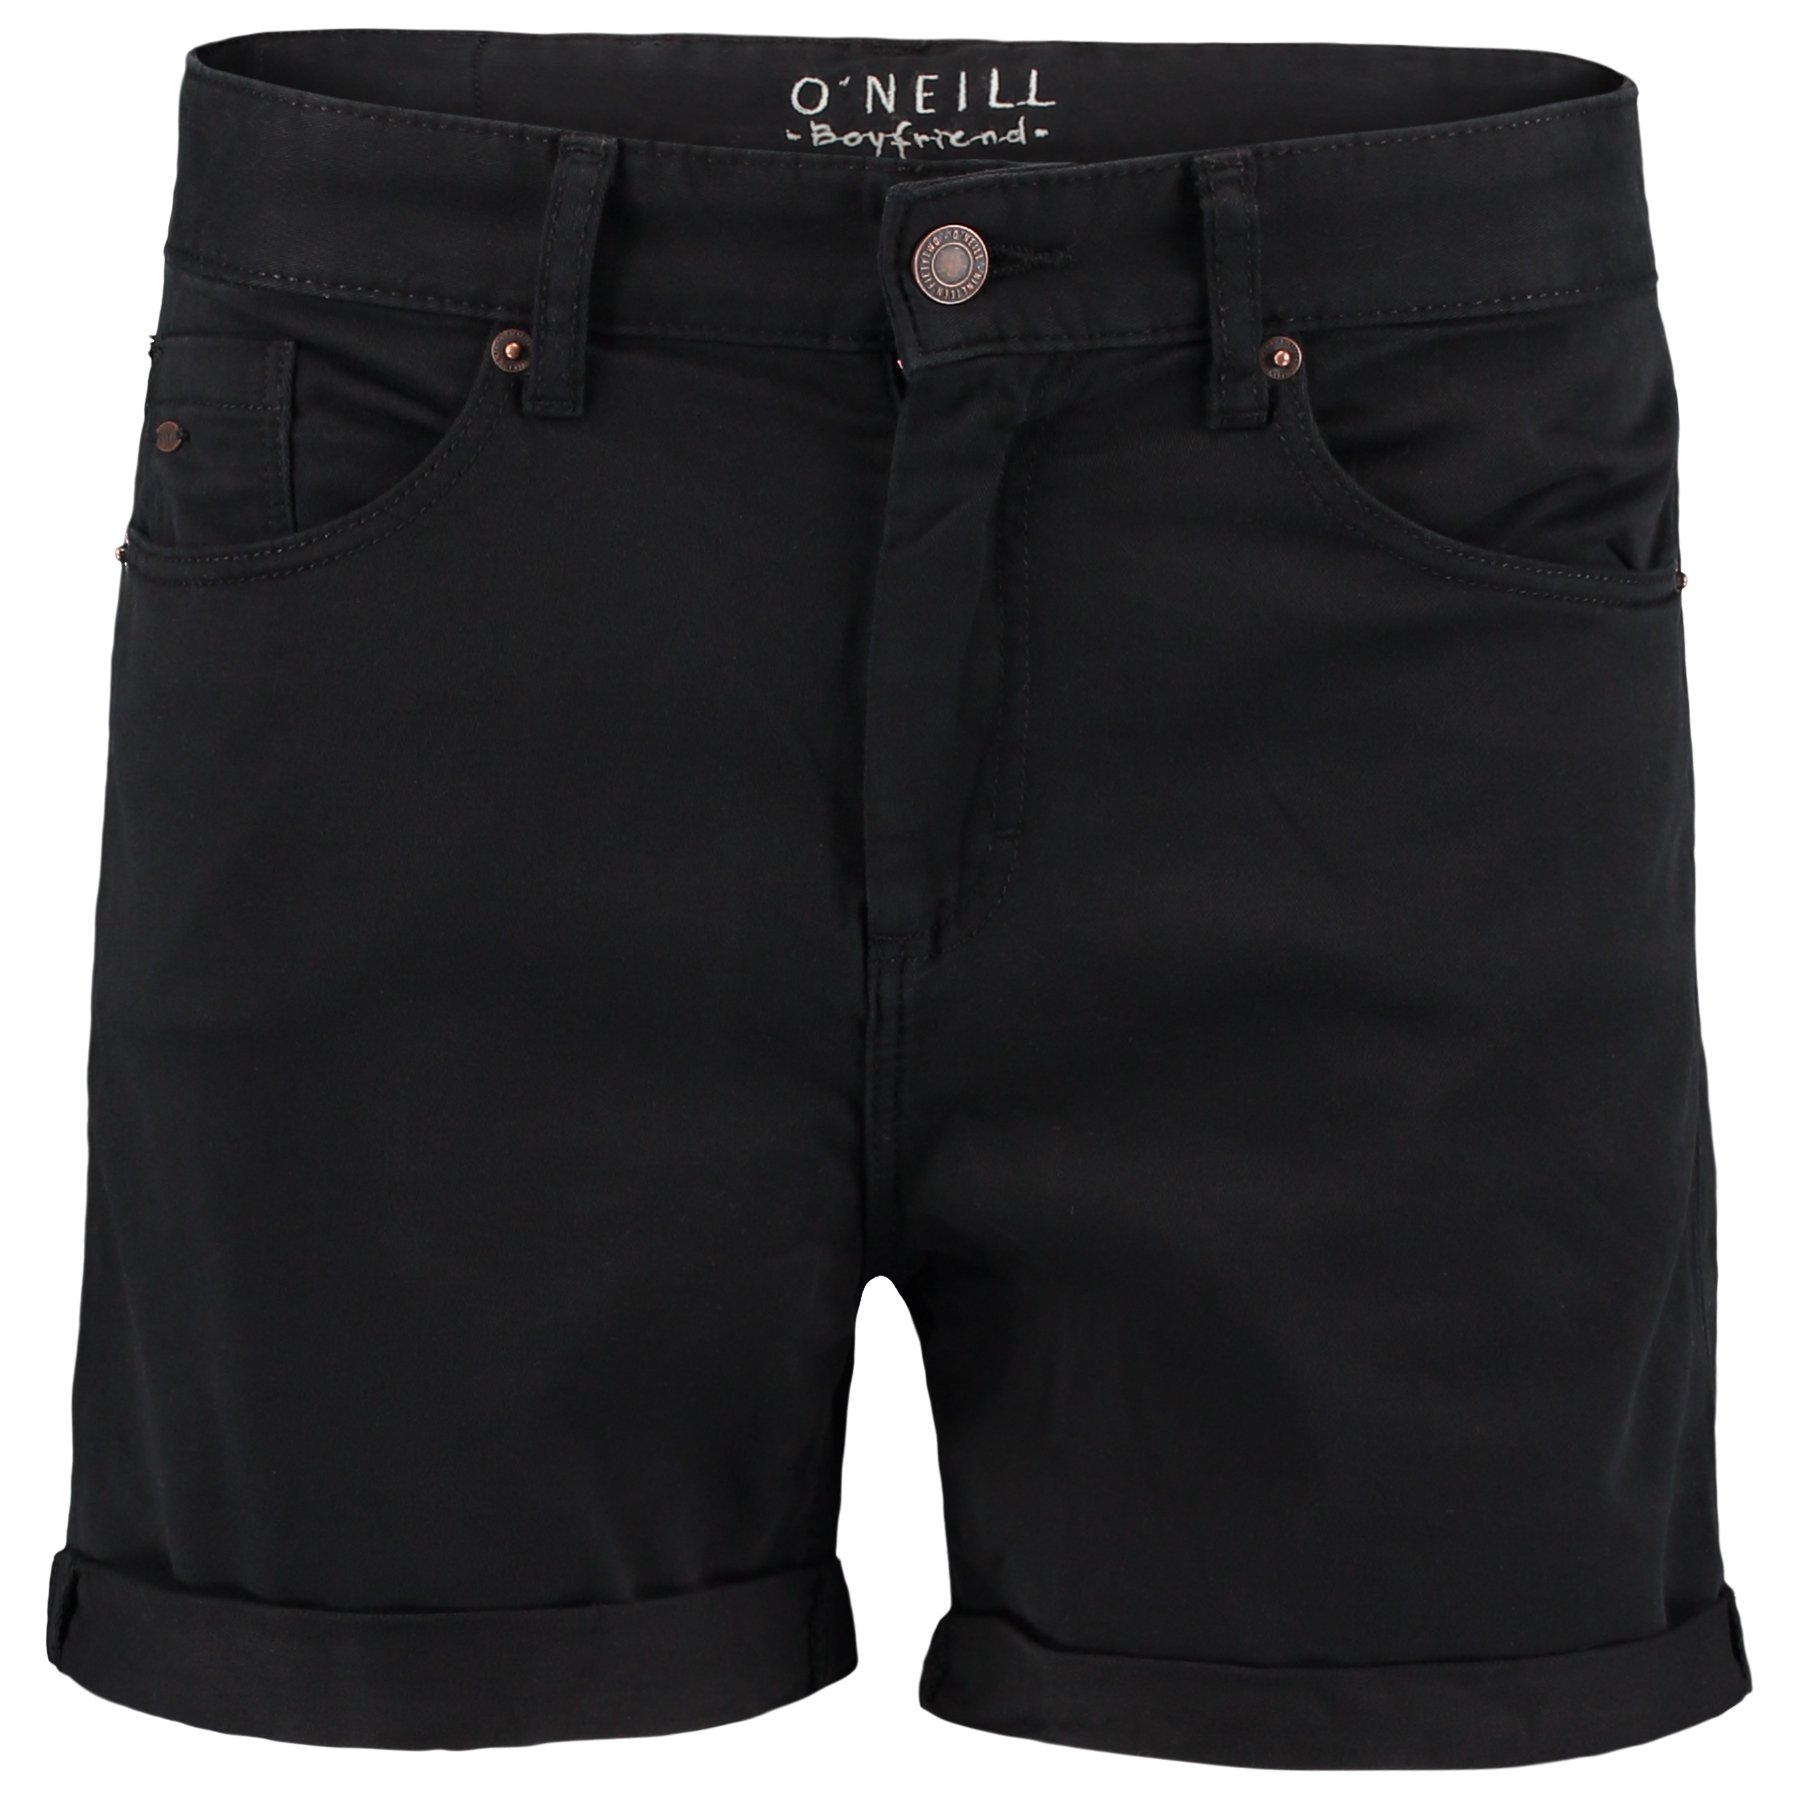 Shorts5 Bij Nu PocketBestel Nu O'neill O'neill Shorts5 PocketBestel Bij OPkn8w0